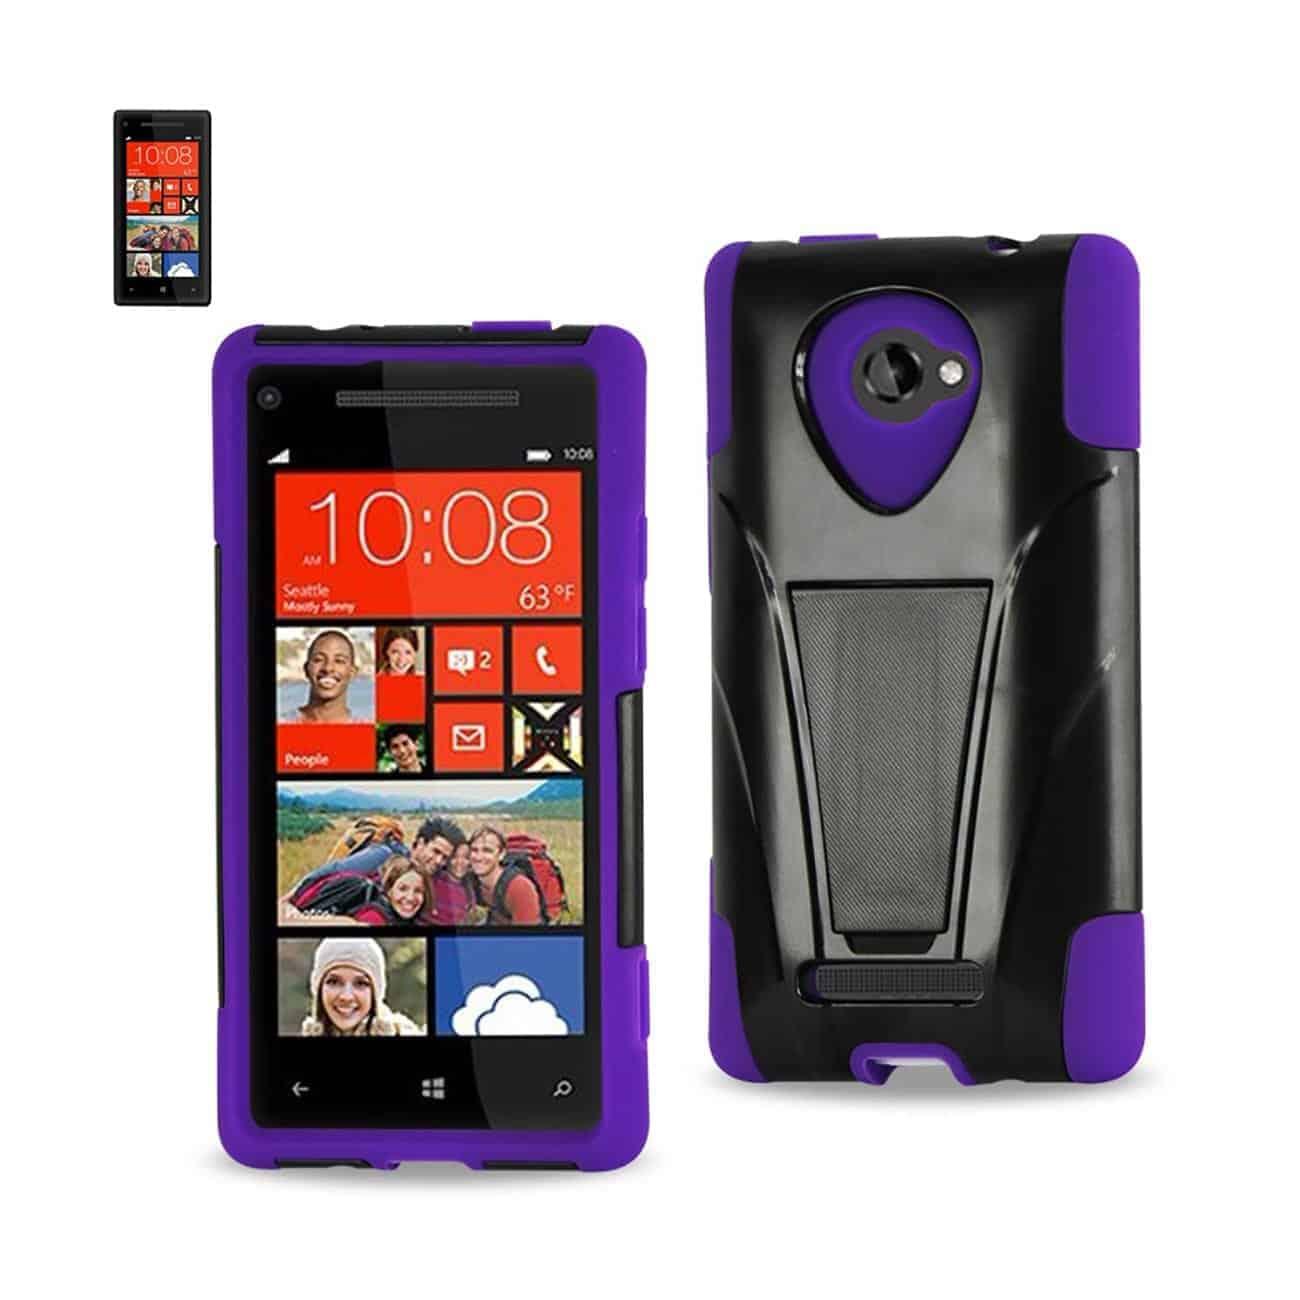 HTC WINDOWS PHONE 8X HYBRID HEAVY DUTY CASE WITH KICKSTAND IN BLACK PURPLE